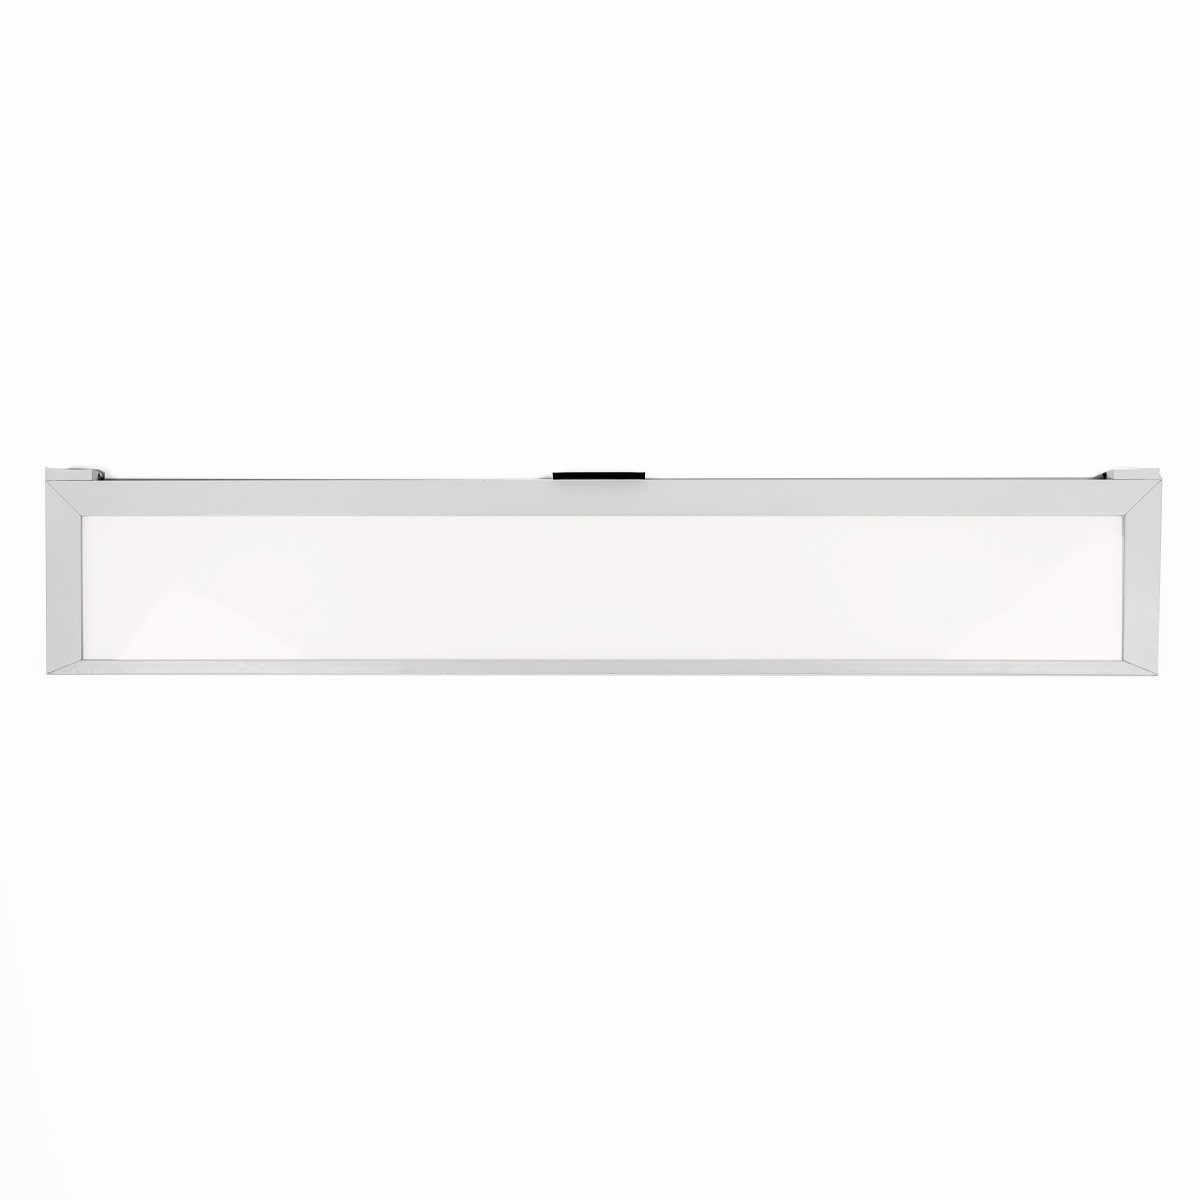 WAC Lighting LN-LED24P-27-WT Contemporary LINE 2.0 LED Undercabinet Light